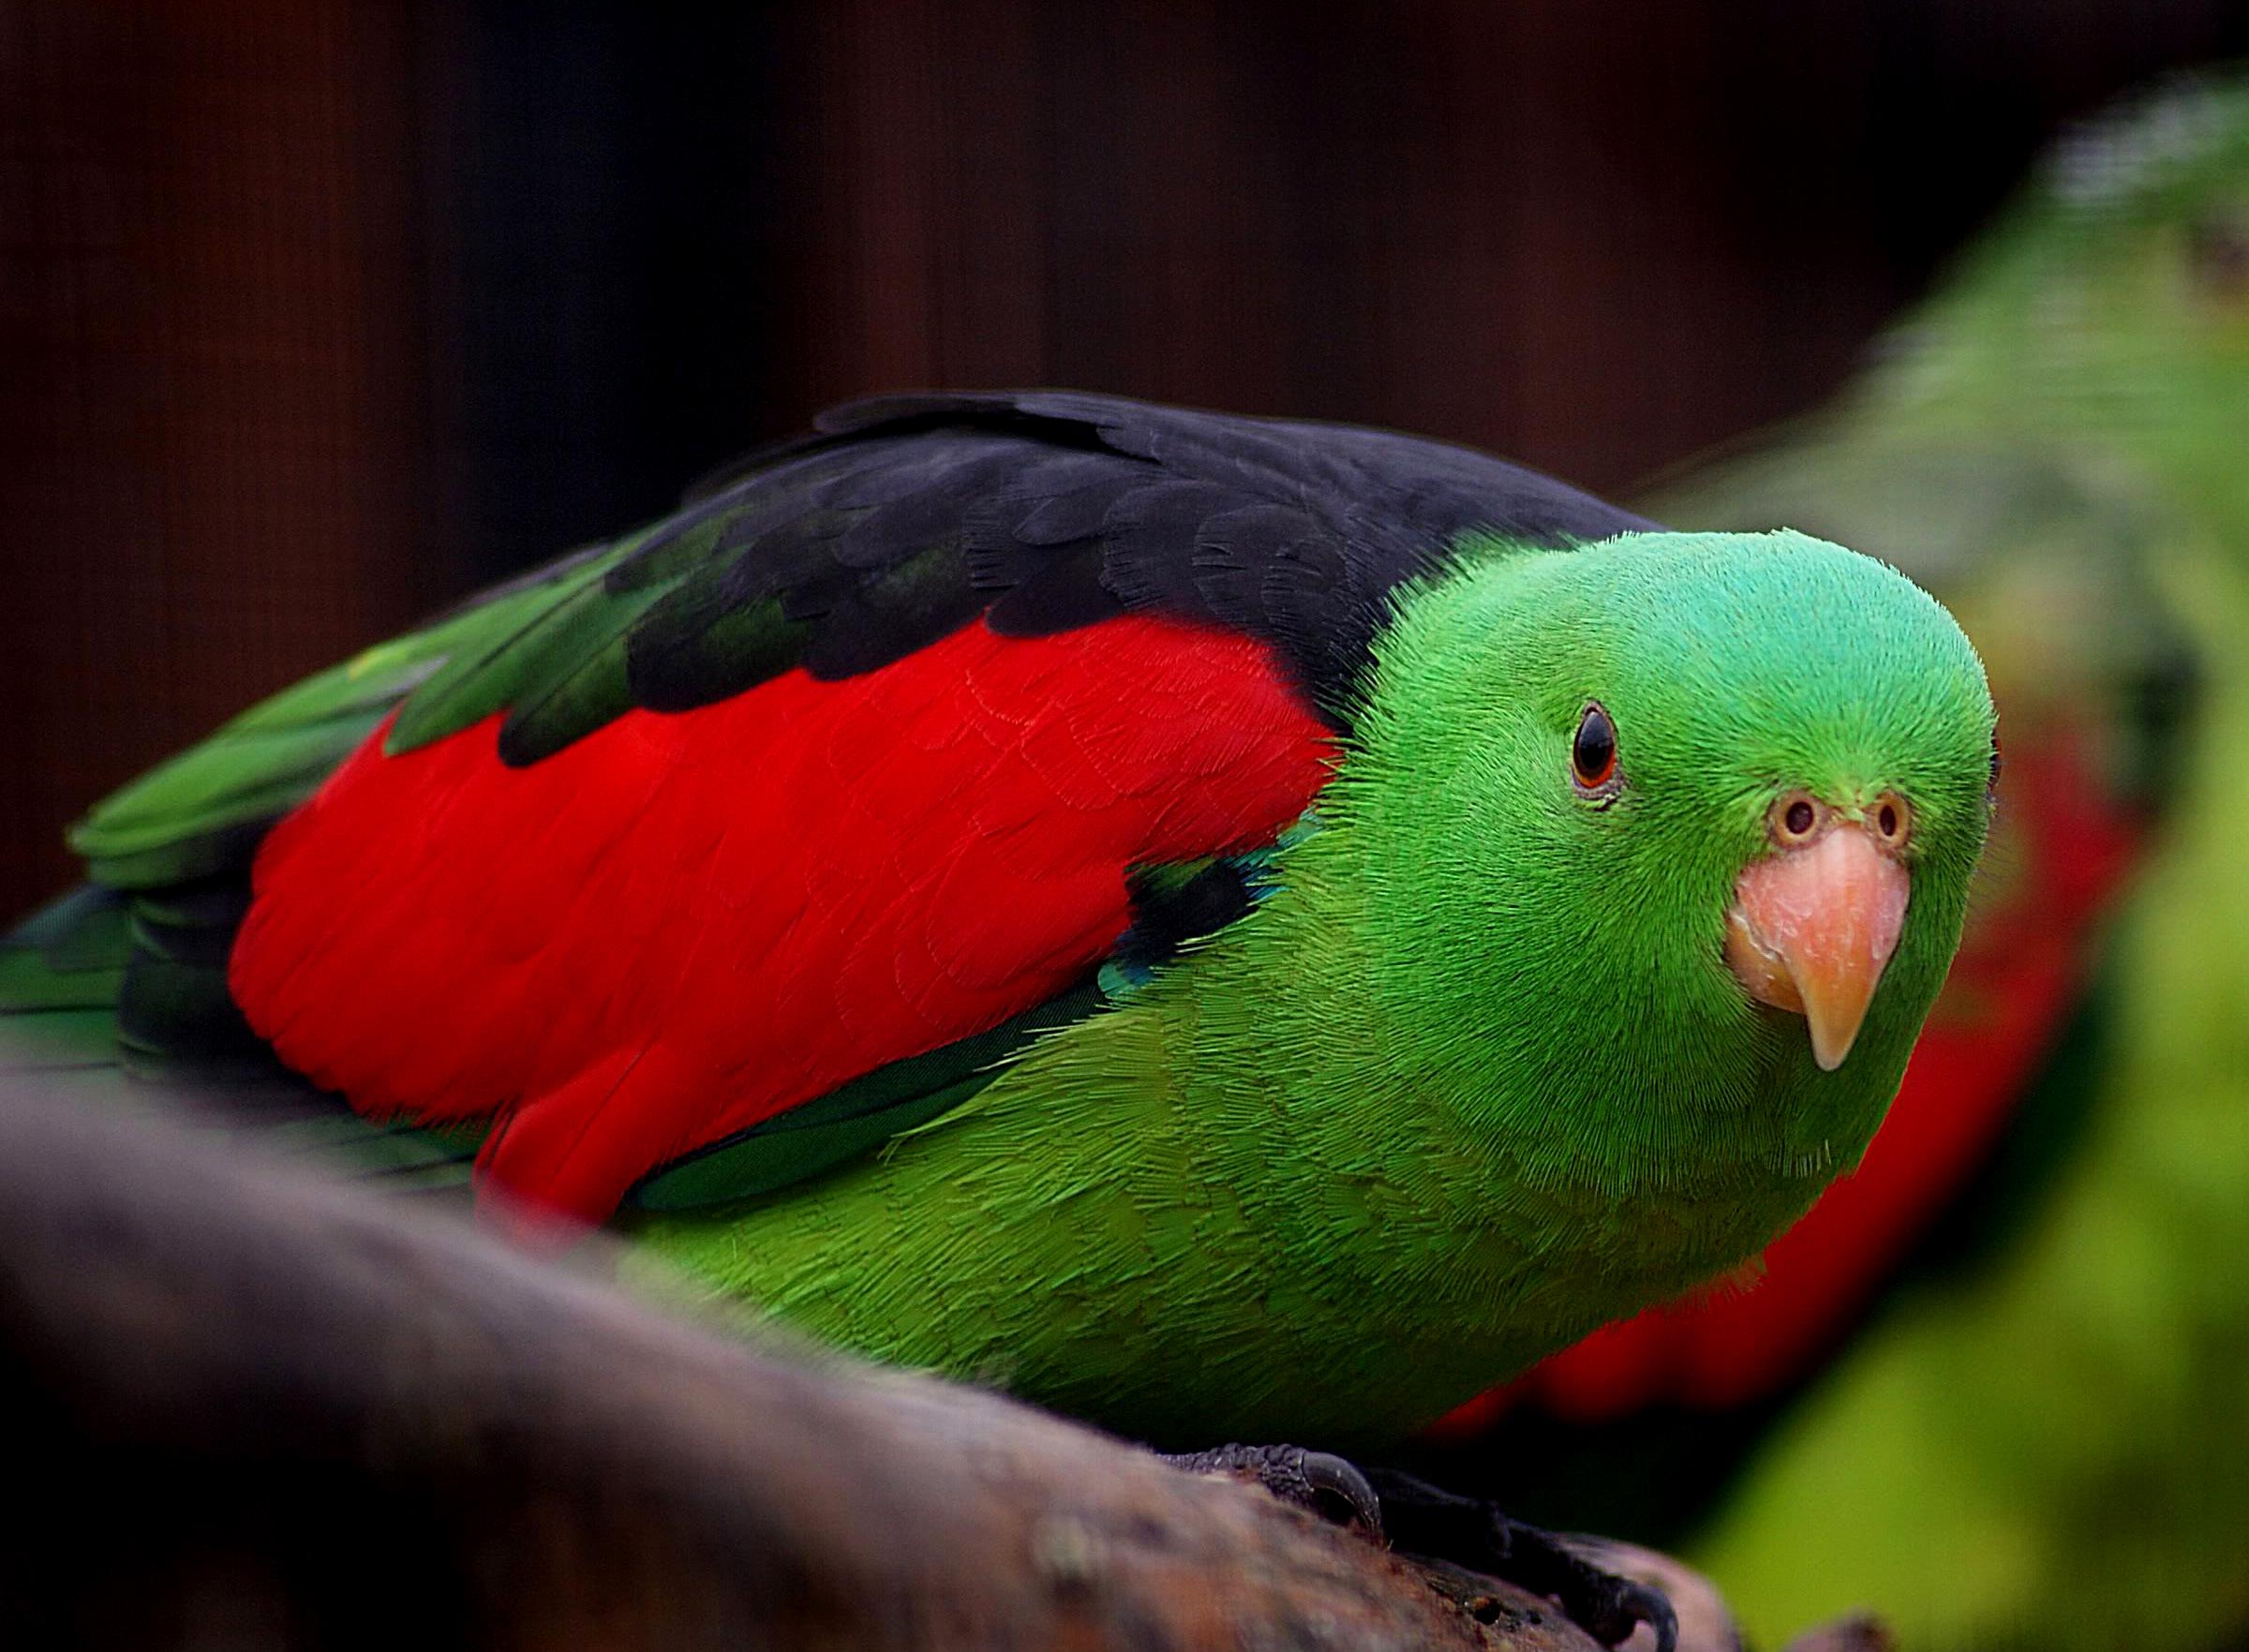 Fotos gratis : pájaro, verde, rojo, pico, fauna, Lorikeet, periquito ...